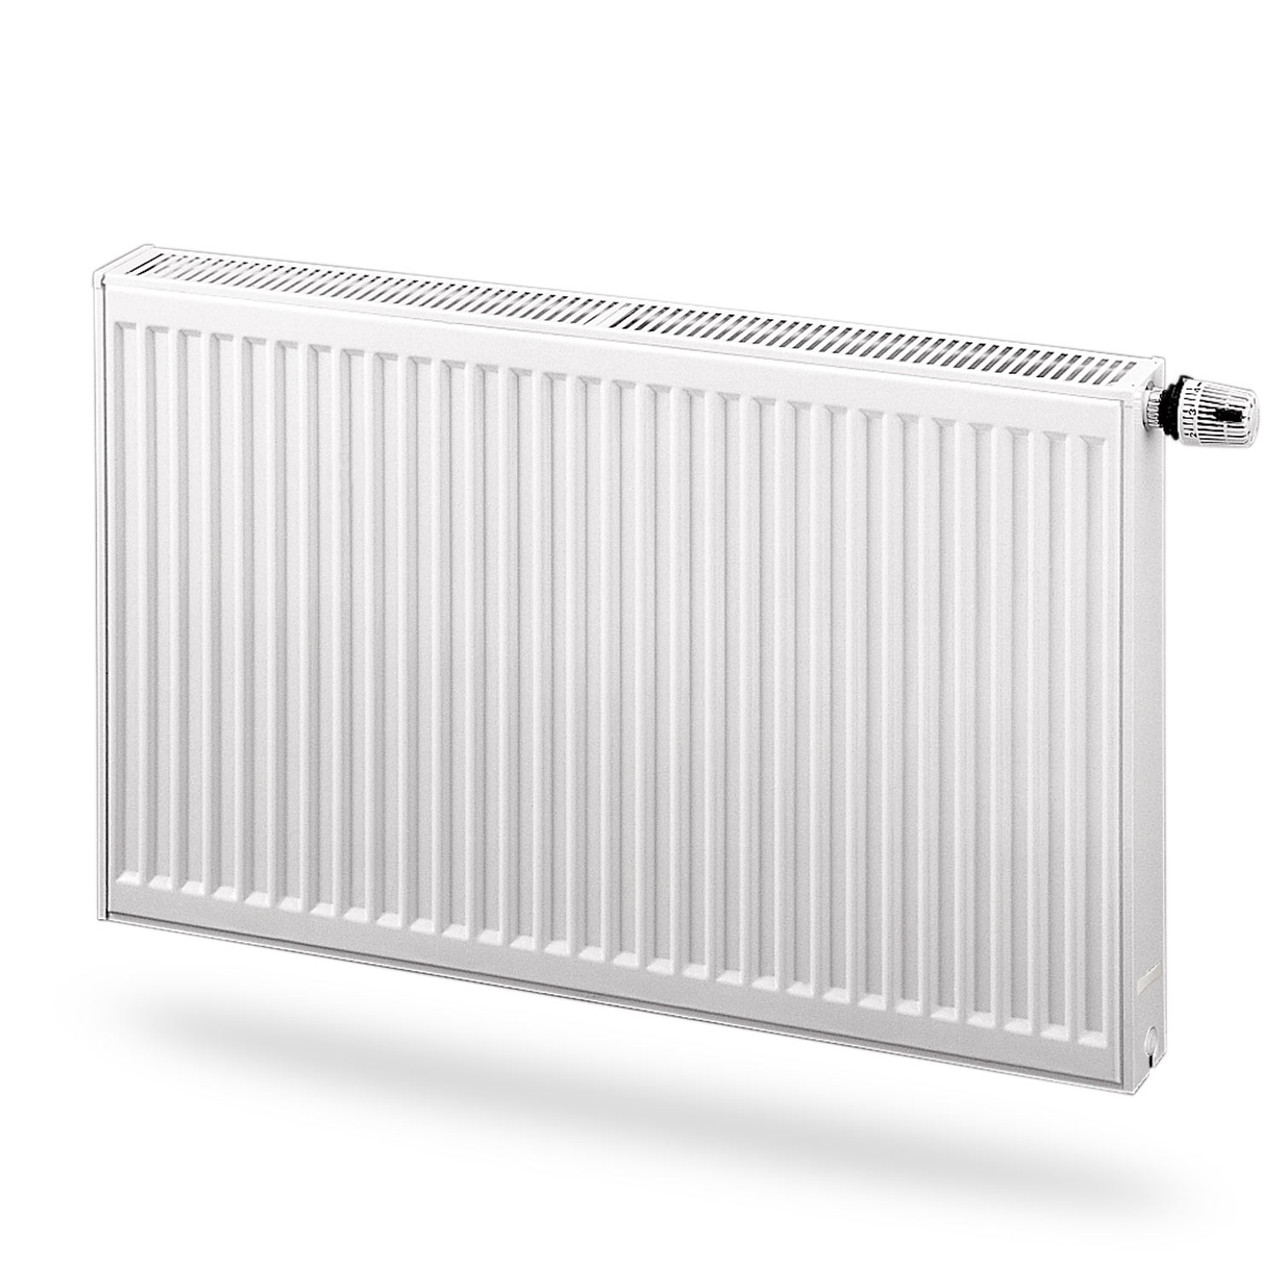 Стальные радиаторы PURMO Ventil Compact 33 300х1600